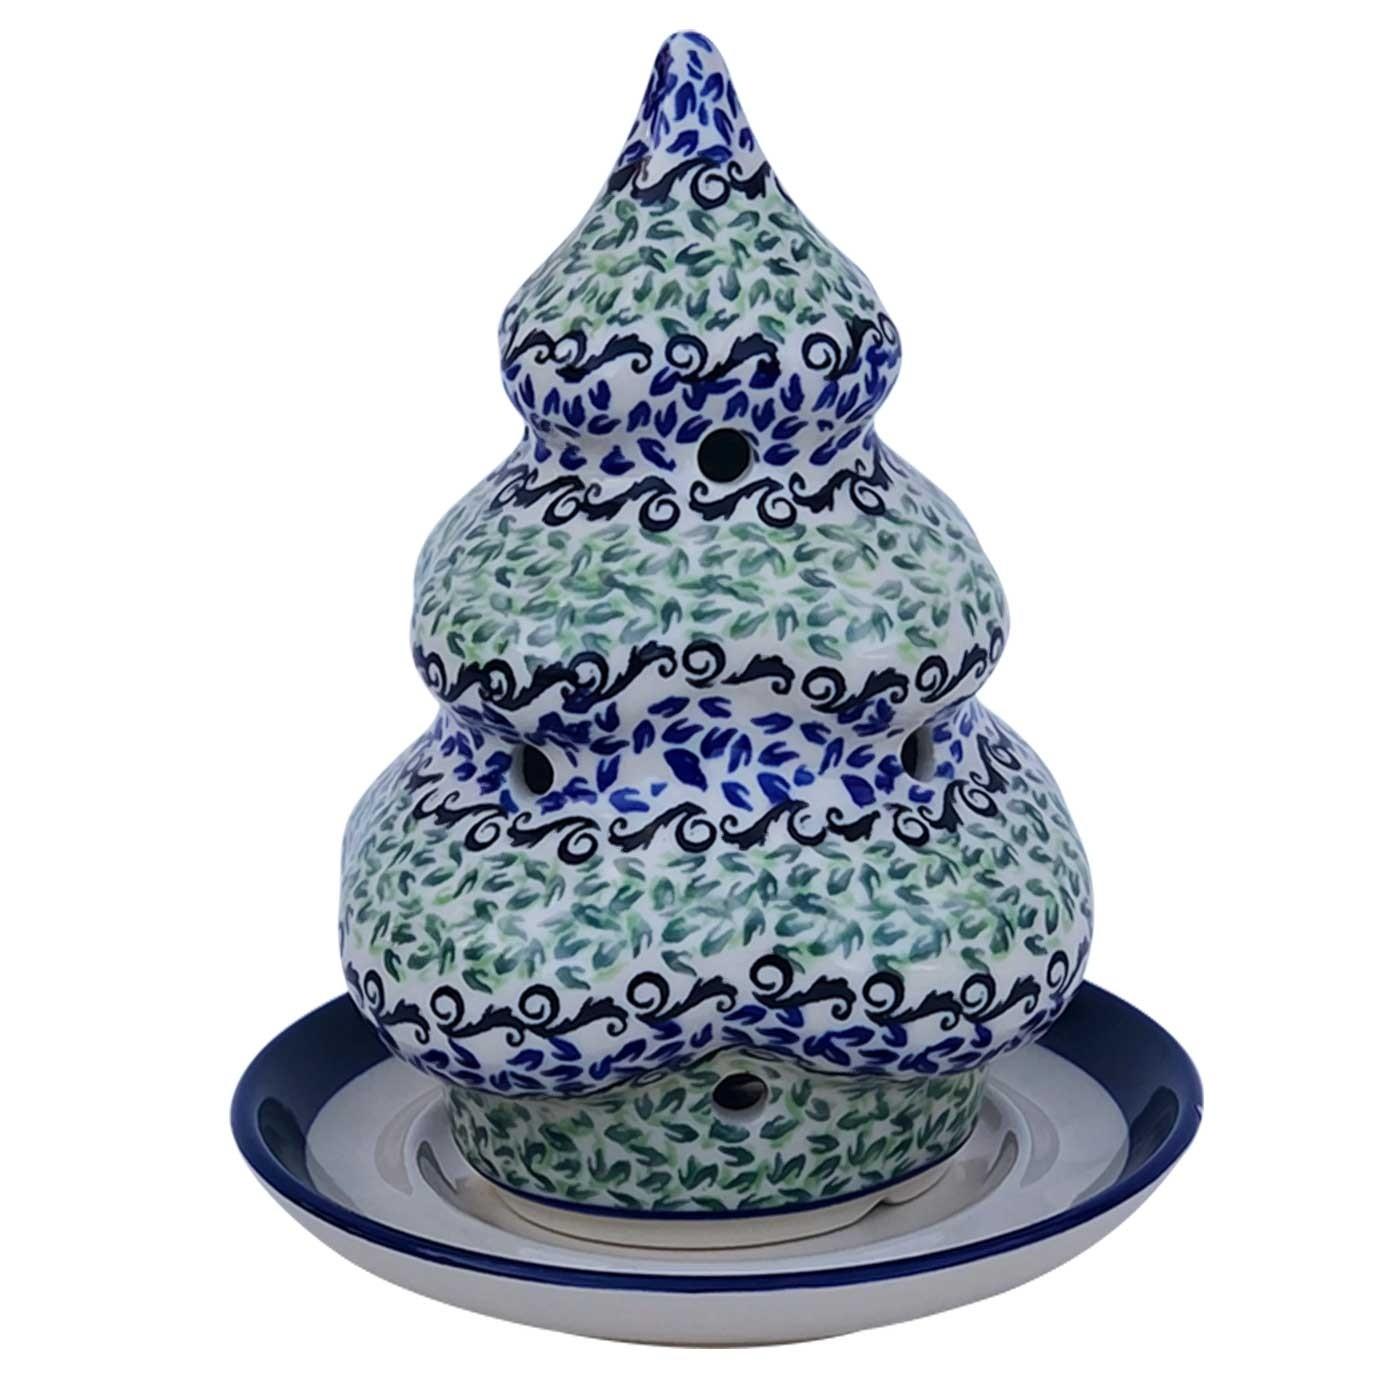 Pottery Avenue Designer 2-pc Candle Stoneware Holder - 1289-1182A